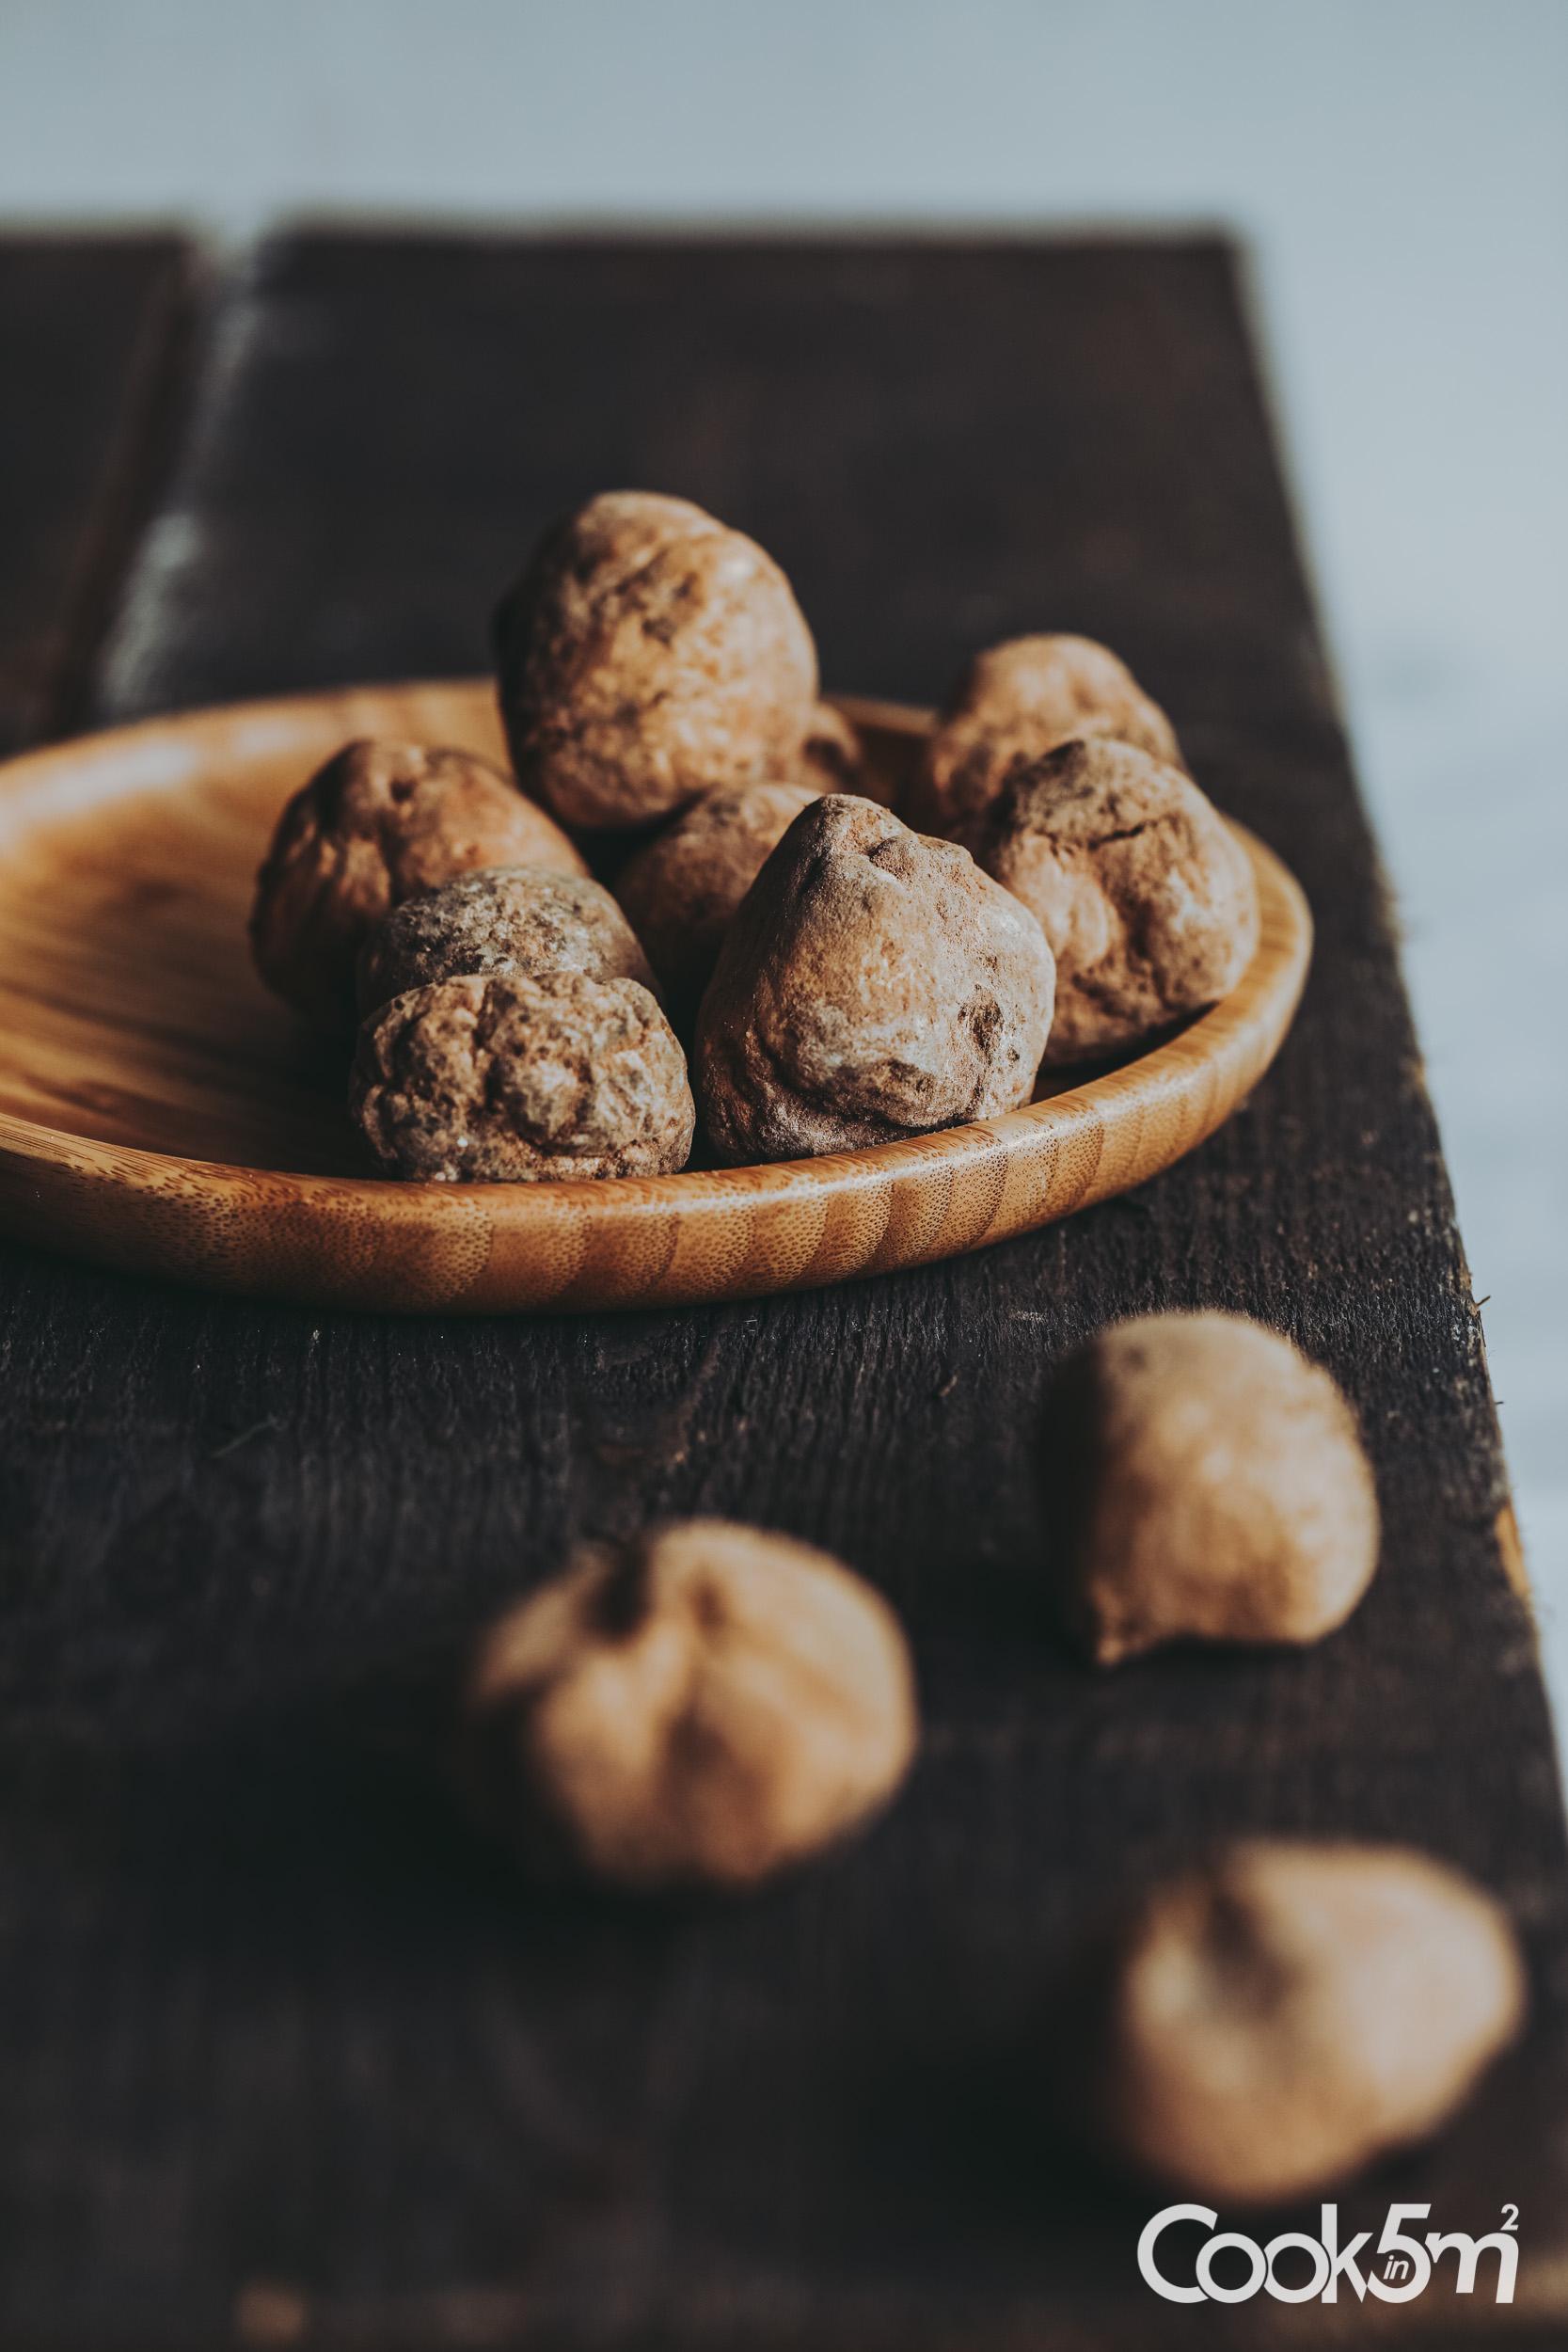 Desert truffle kema kama food photography - cookin5m2-0012